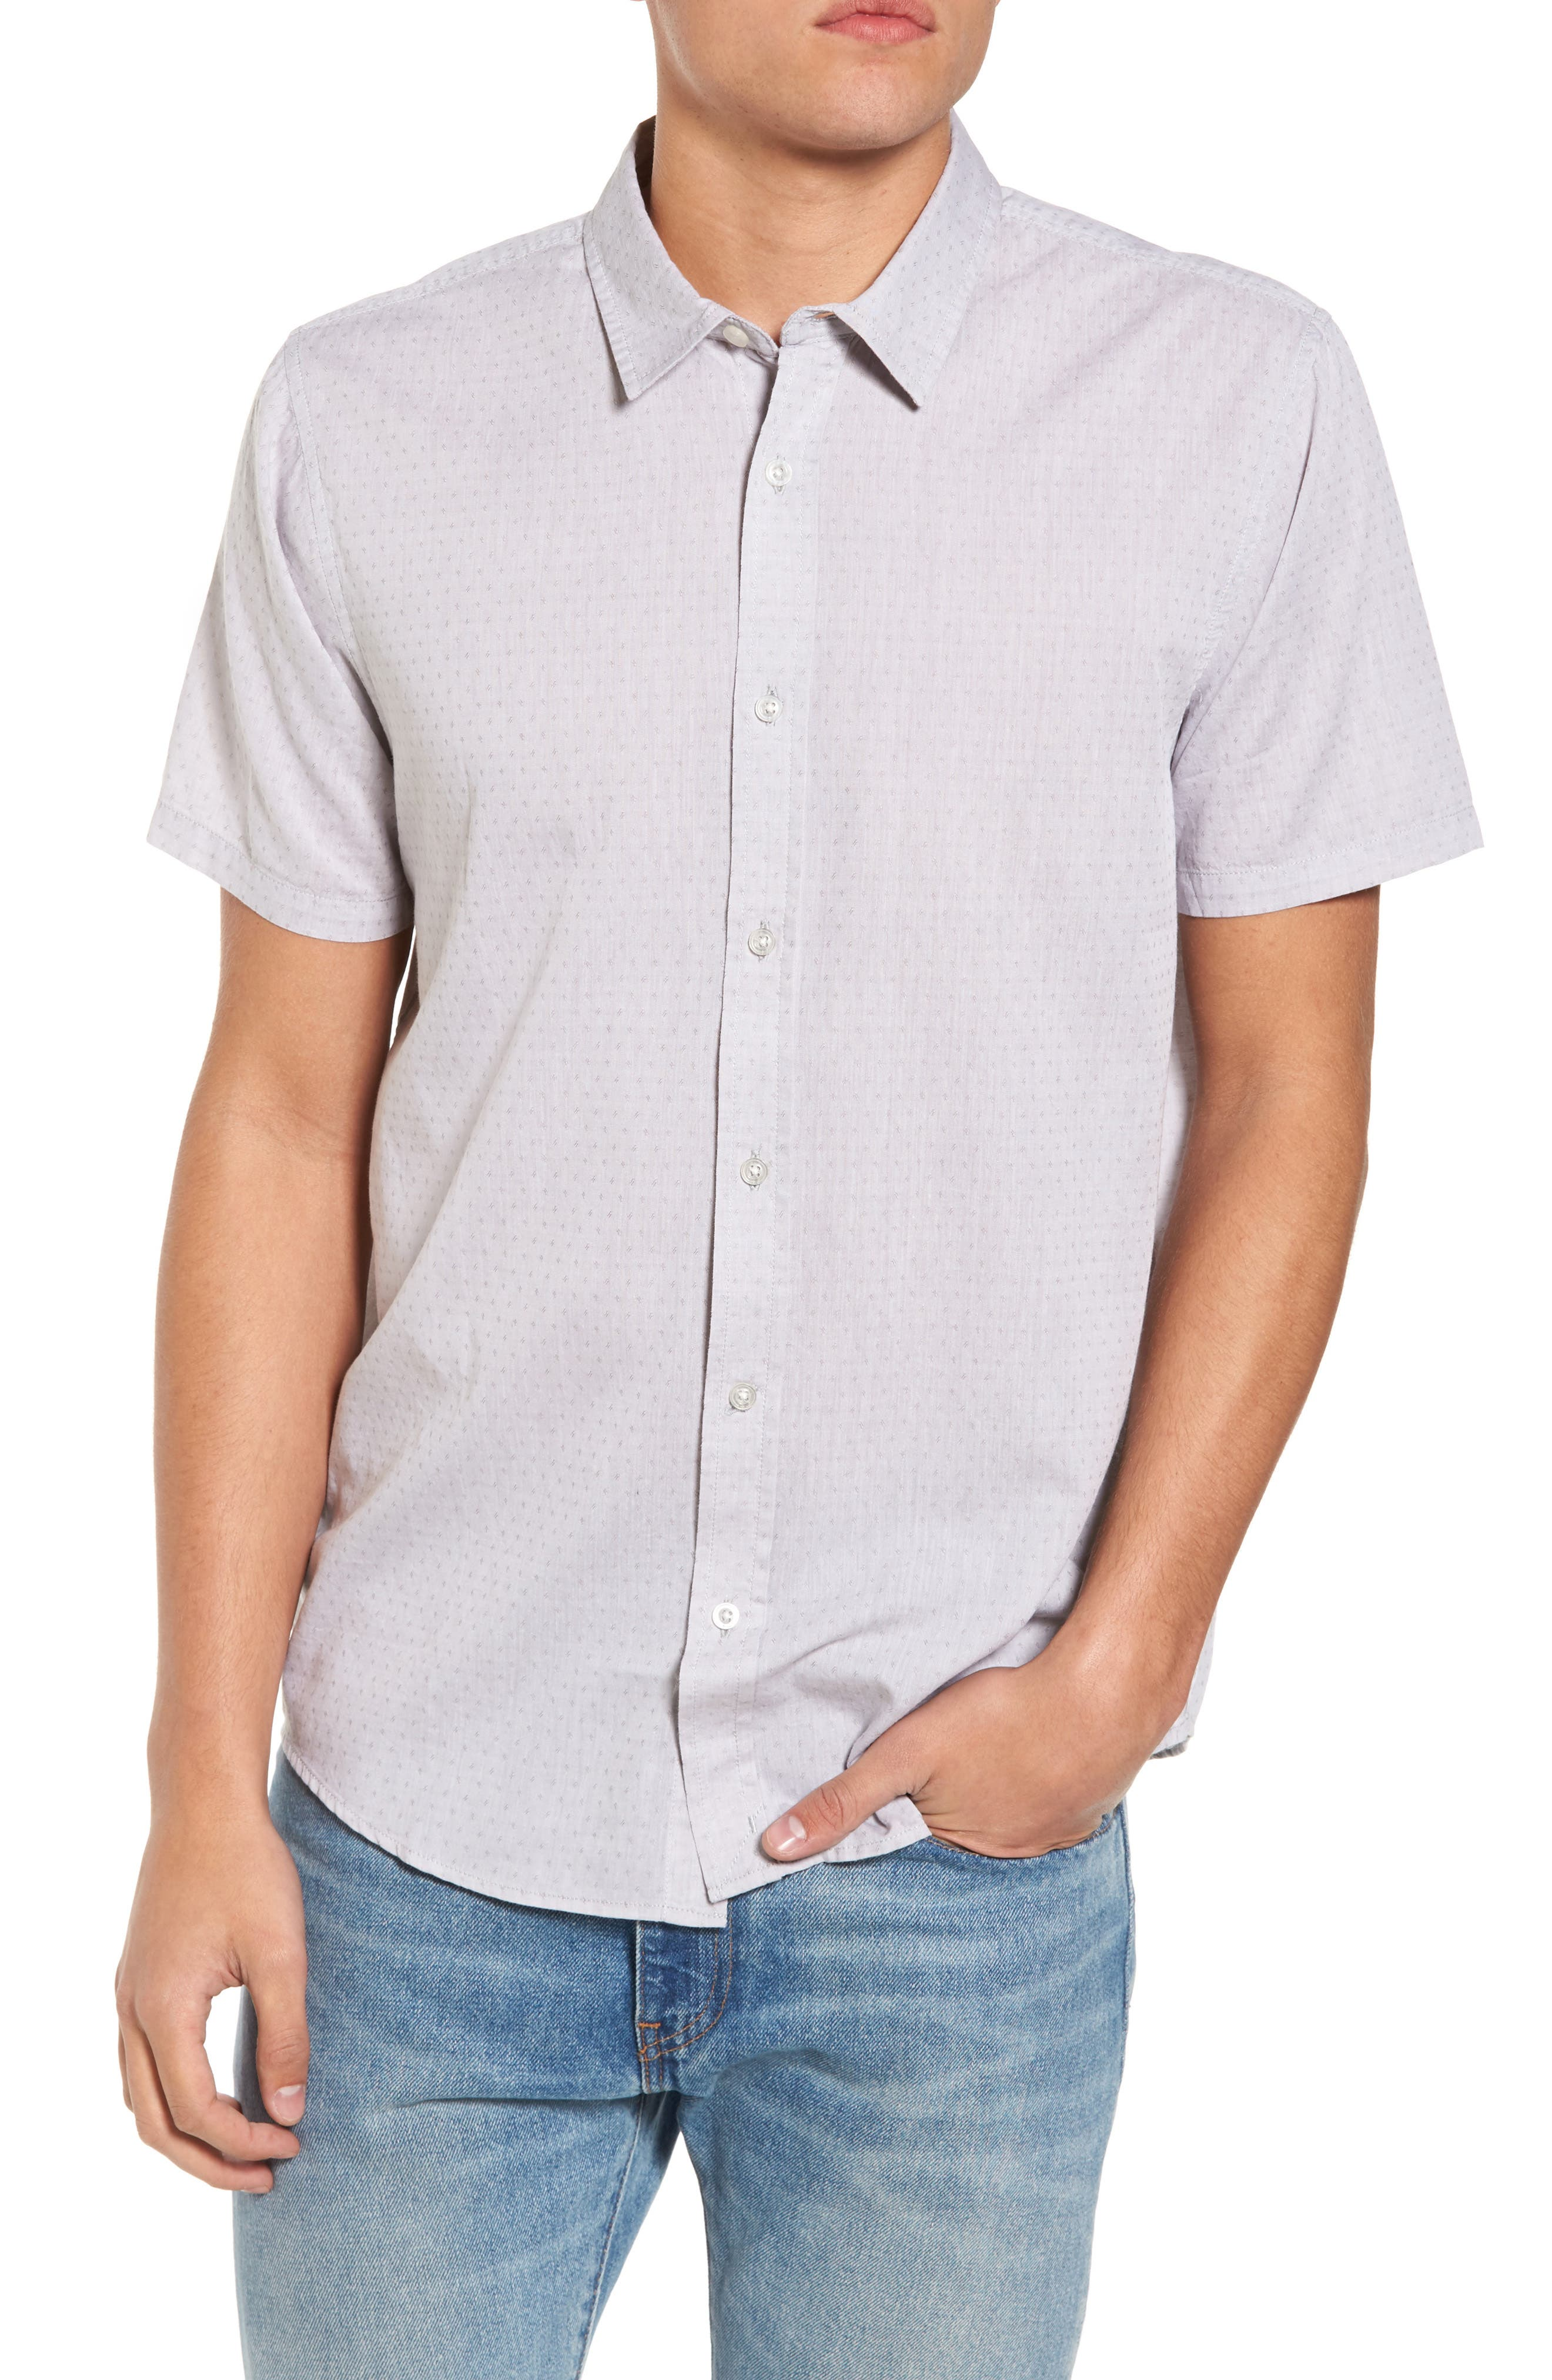 Clarke Woven Shirt,                             Main thumbnail 1, color,                             100